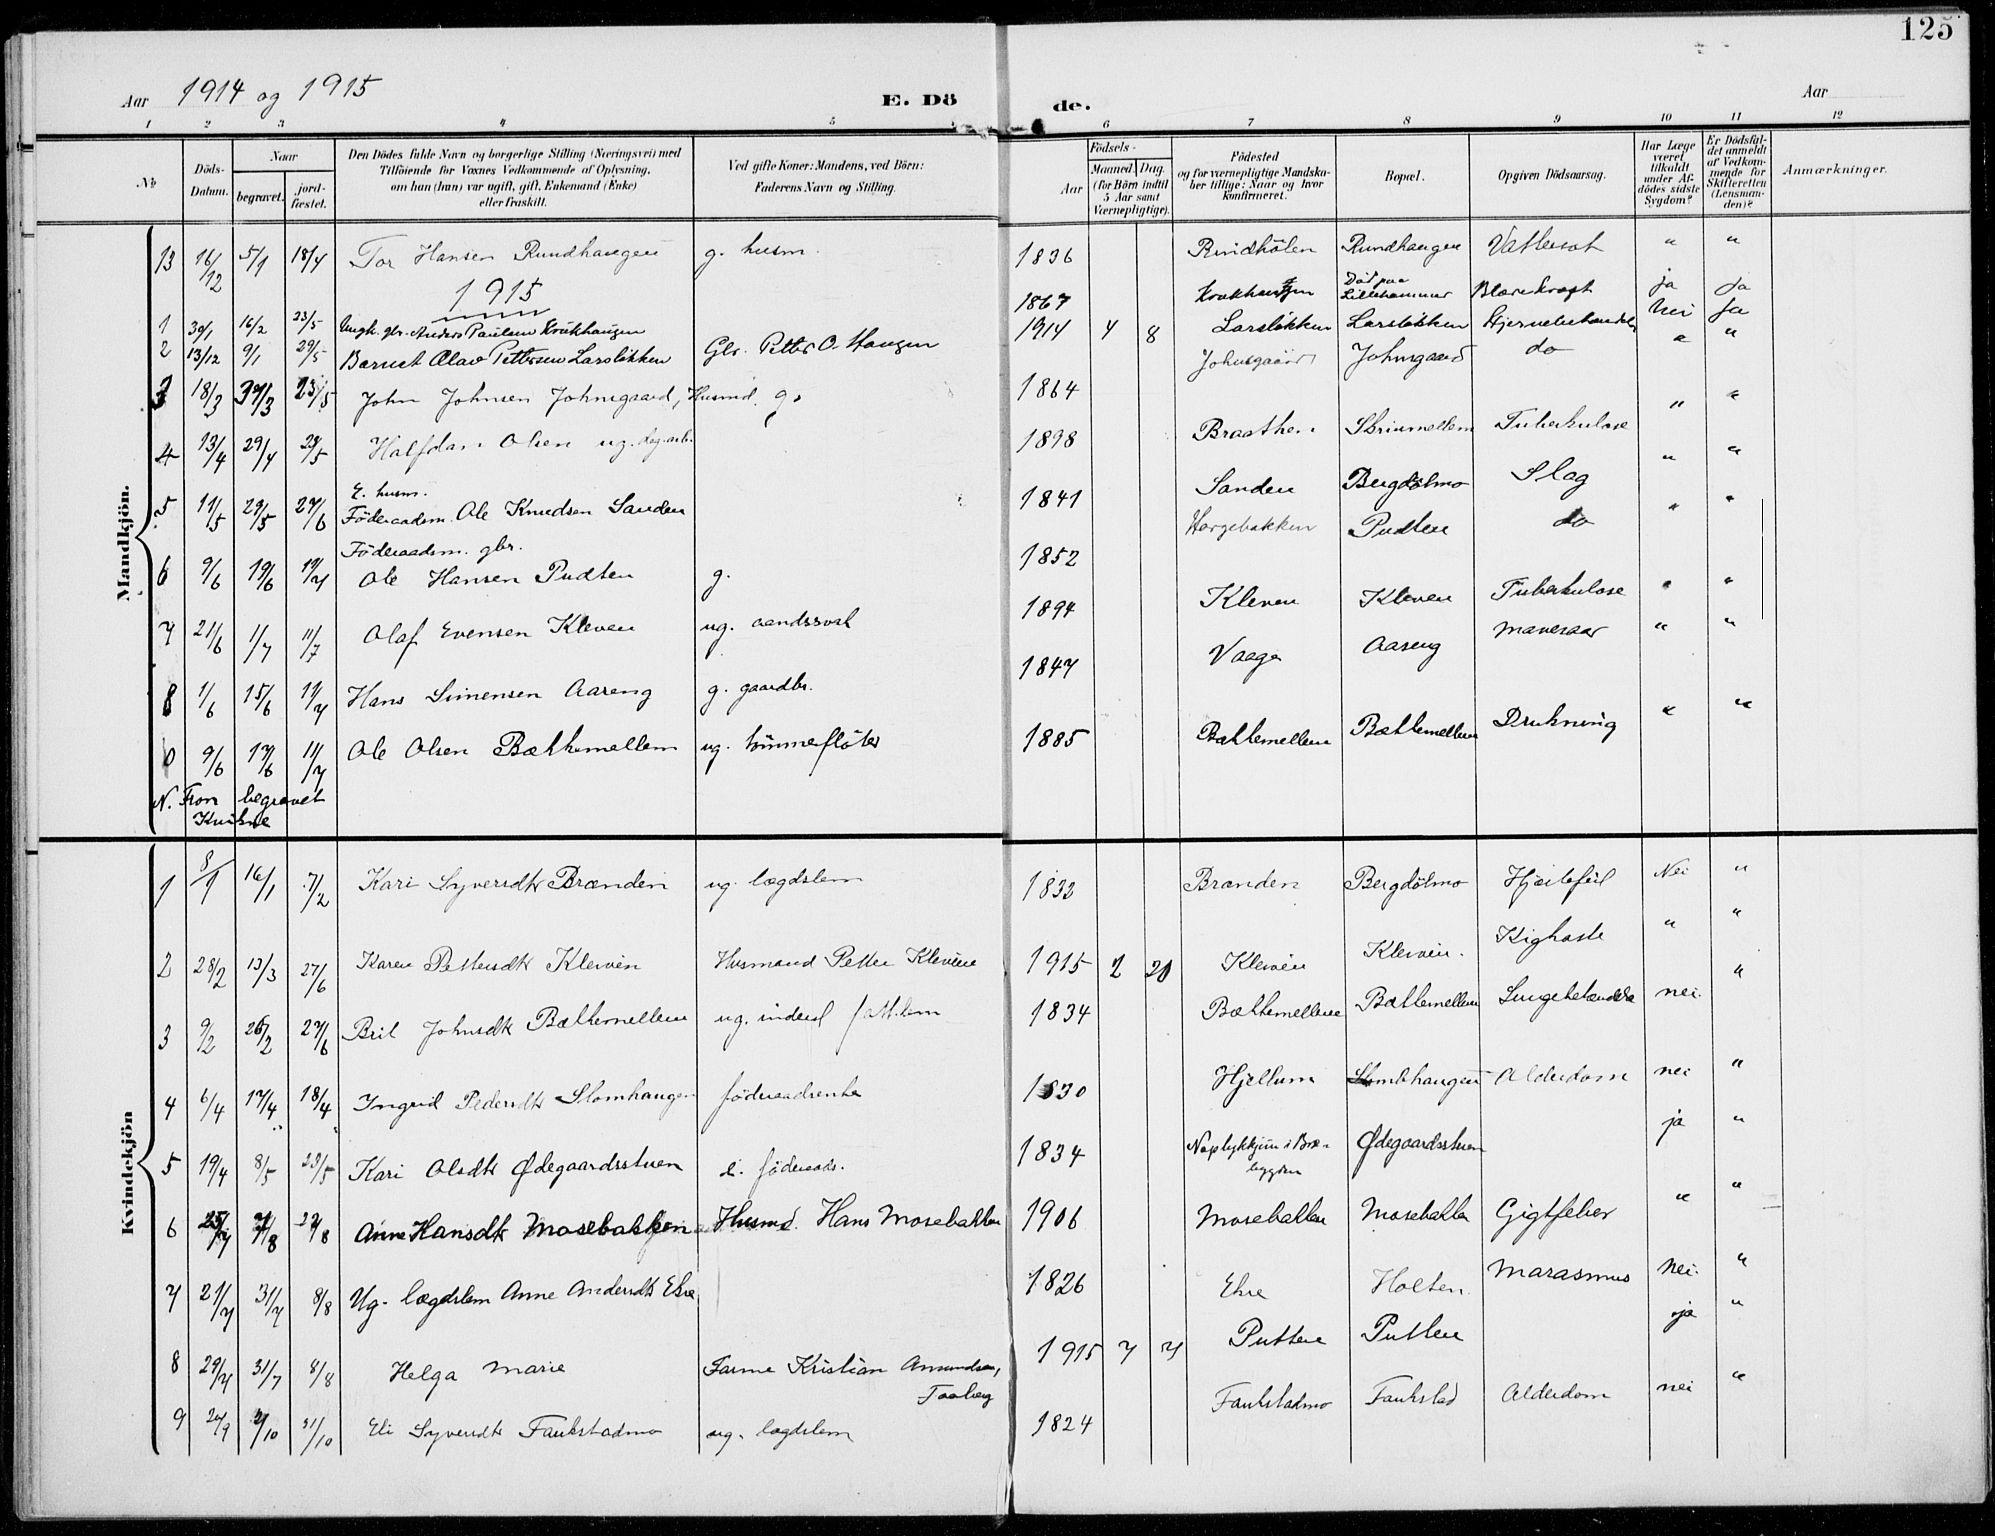 SAH, Sel prestekontor, Ministerialbok nr. 1, 1905-1922, s. 125